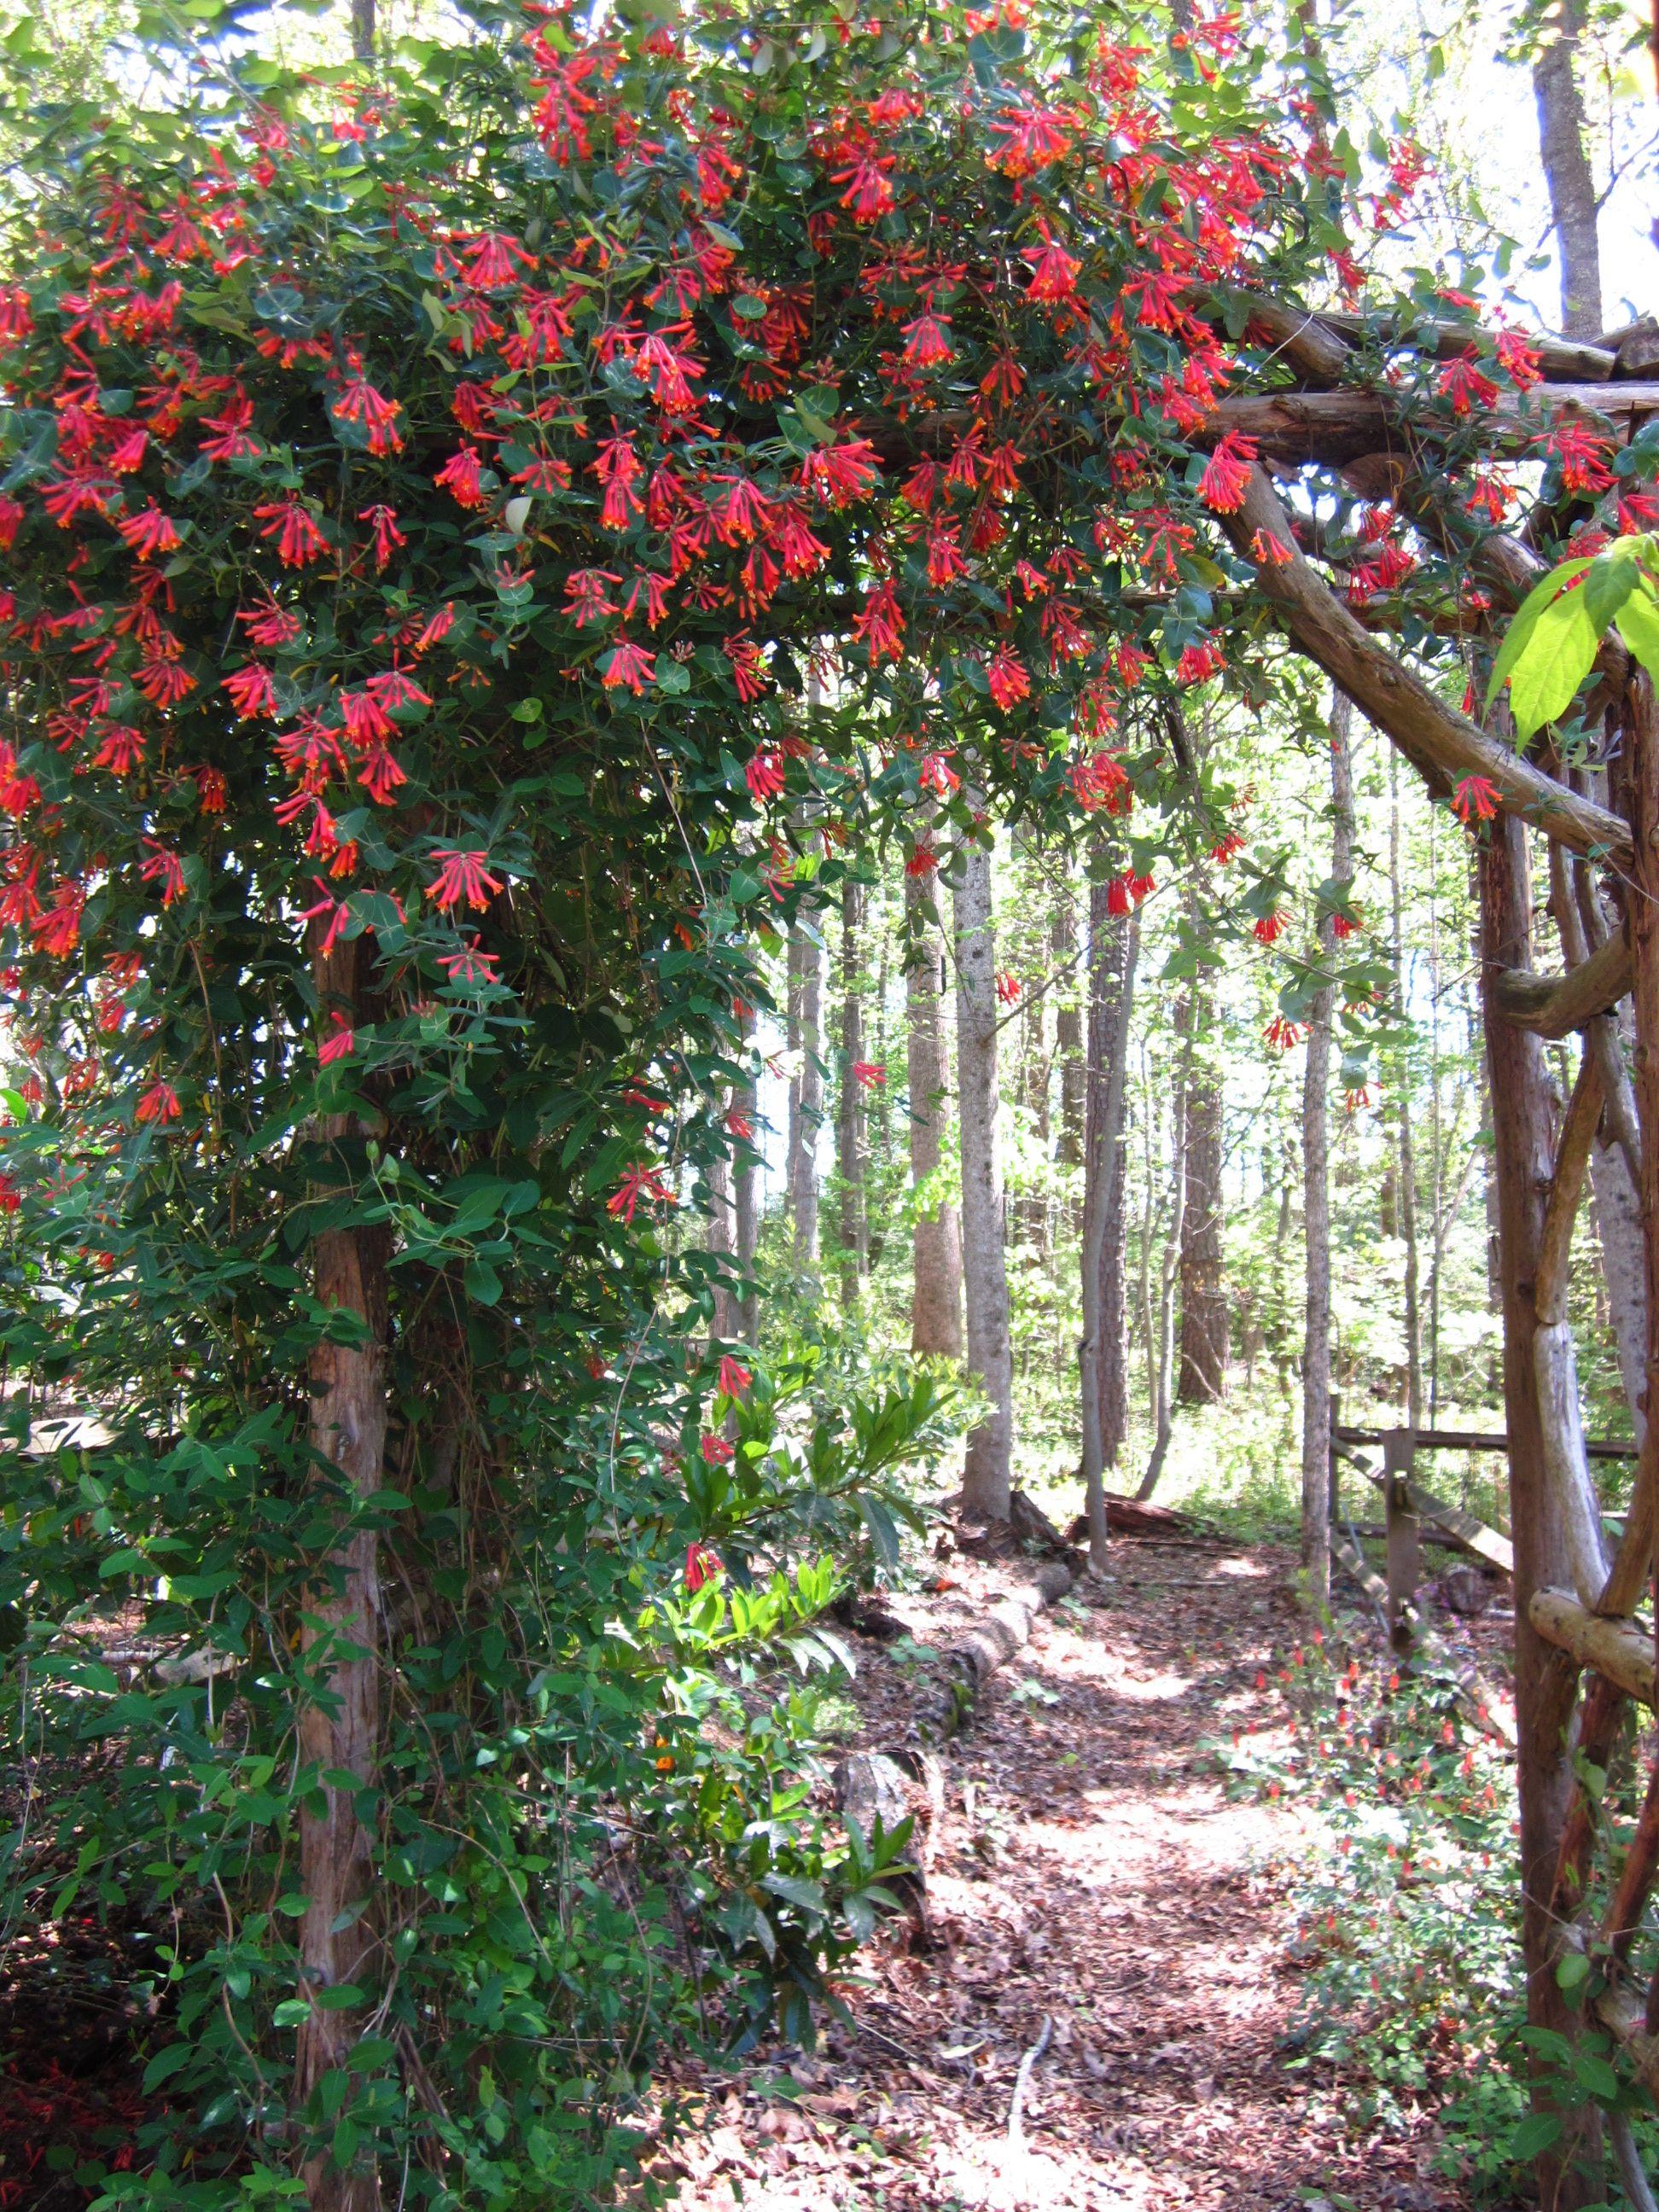 Coral honeysuckle vine